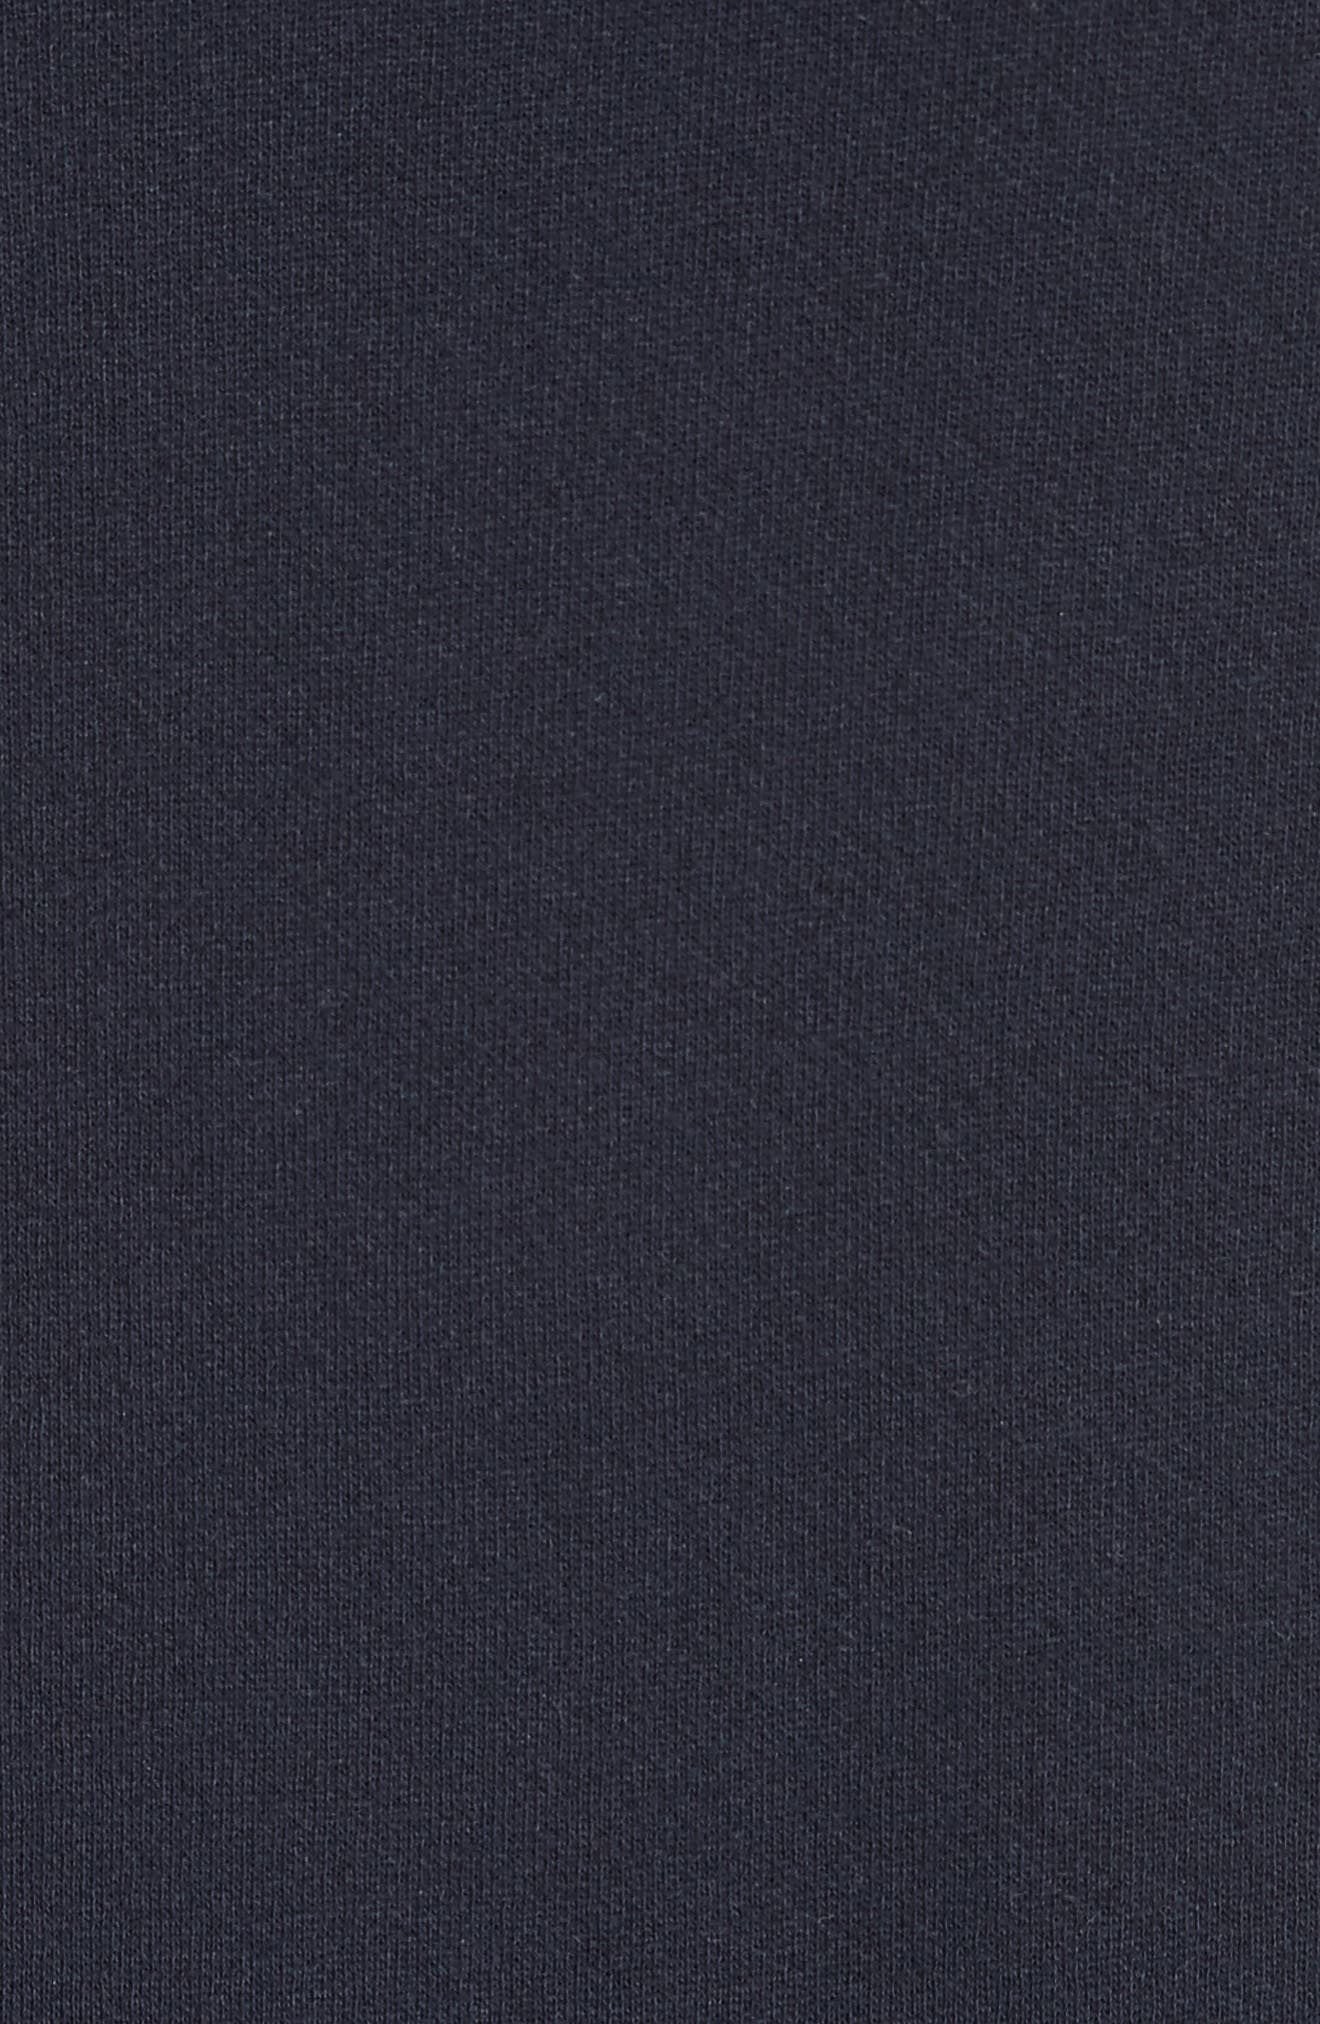 Pocket Sleeve Sweatshirt,                             Alternate thumbnail 5, color,                             Navy